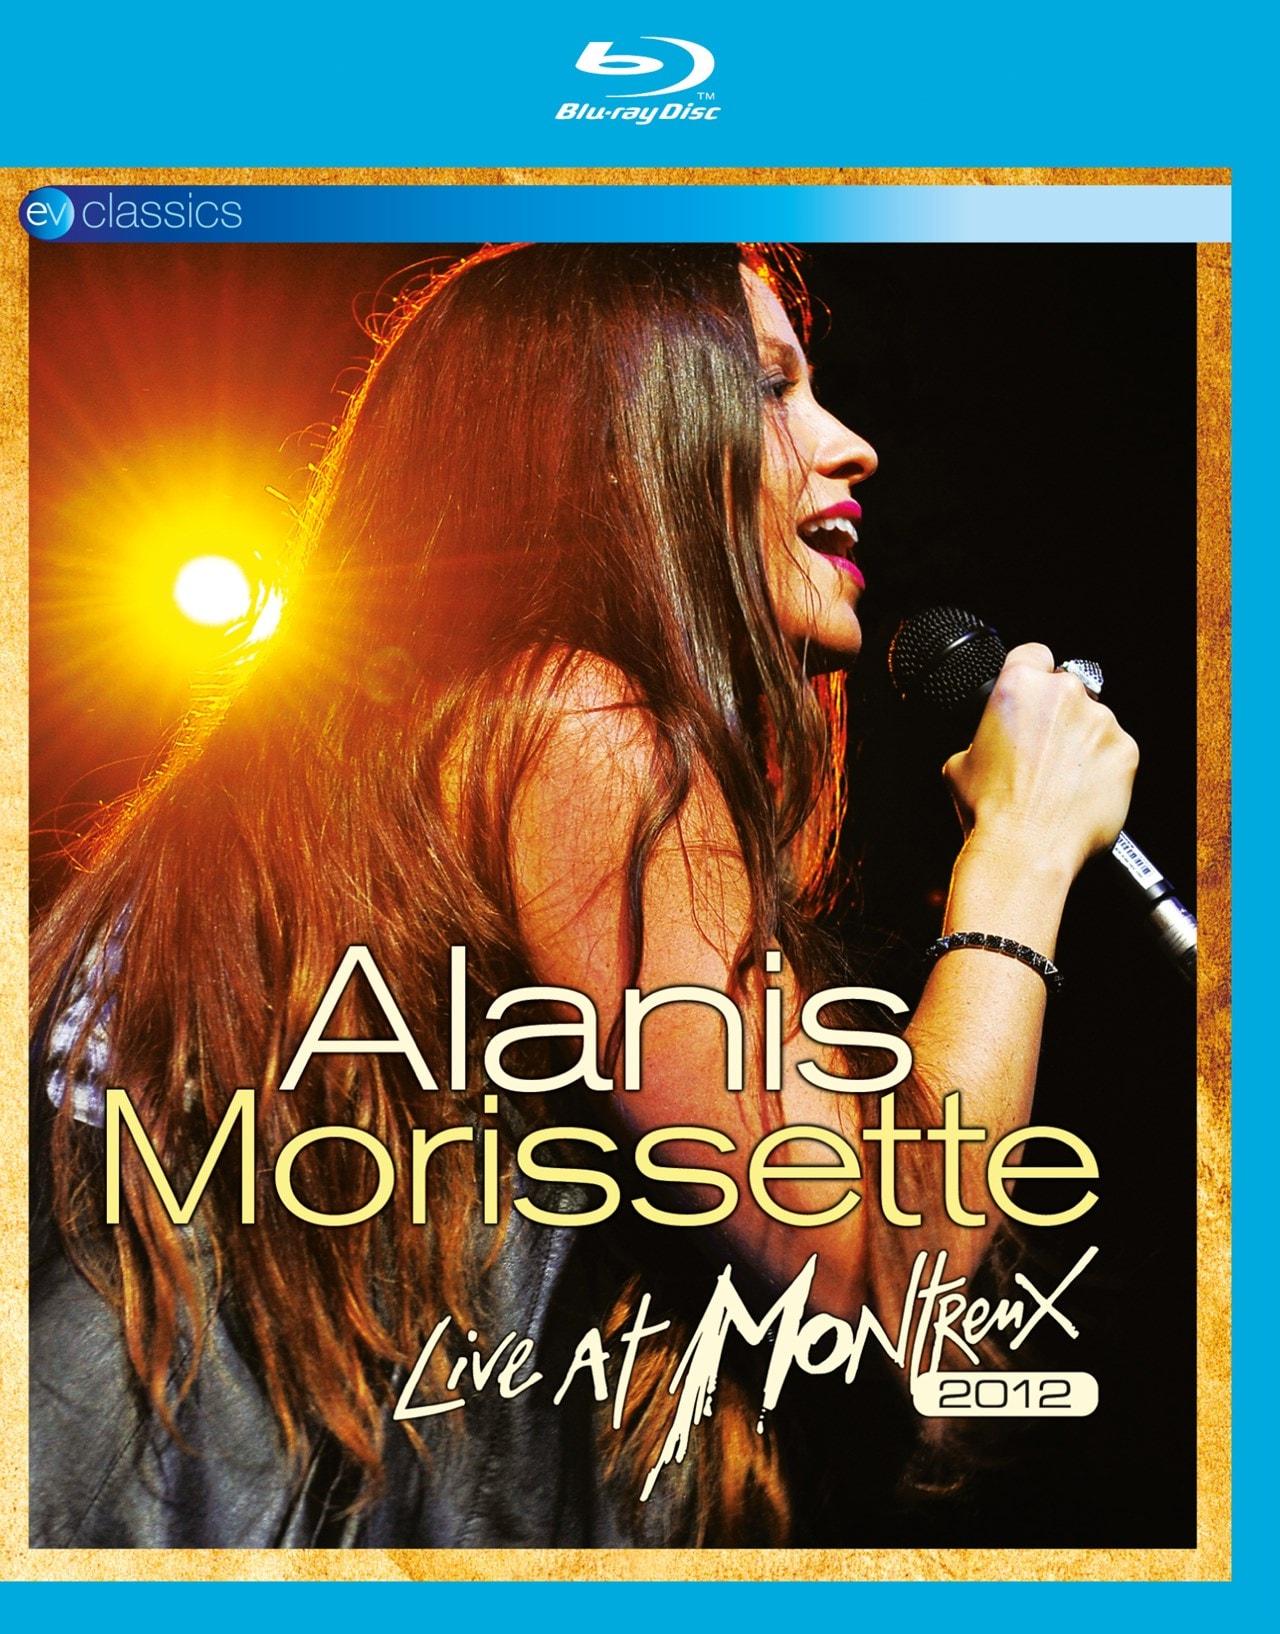 Alanis Morrissette: Live at Montreux 2012 - 1